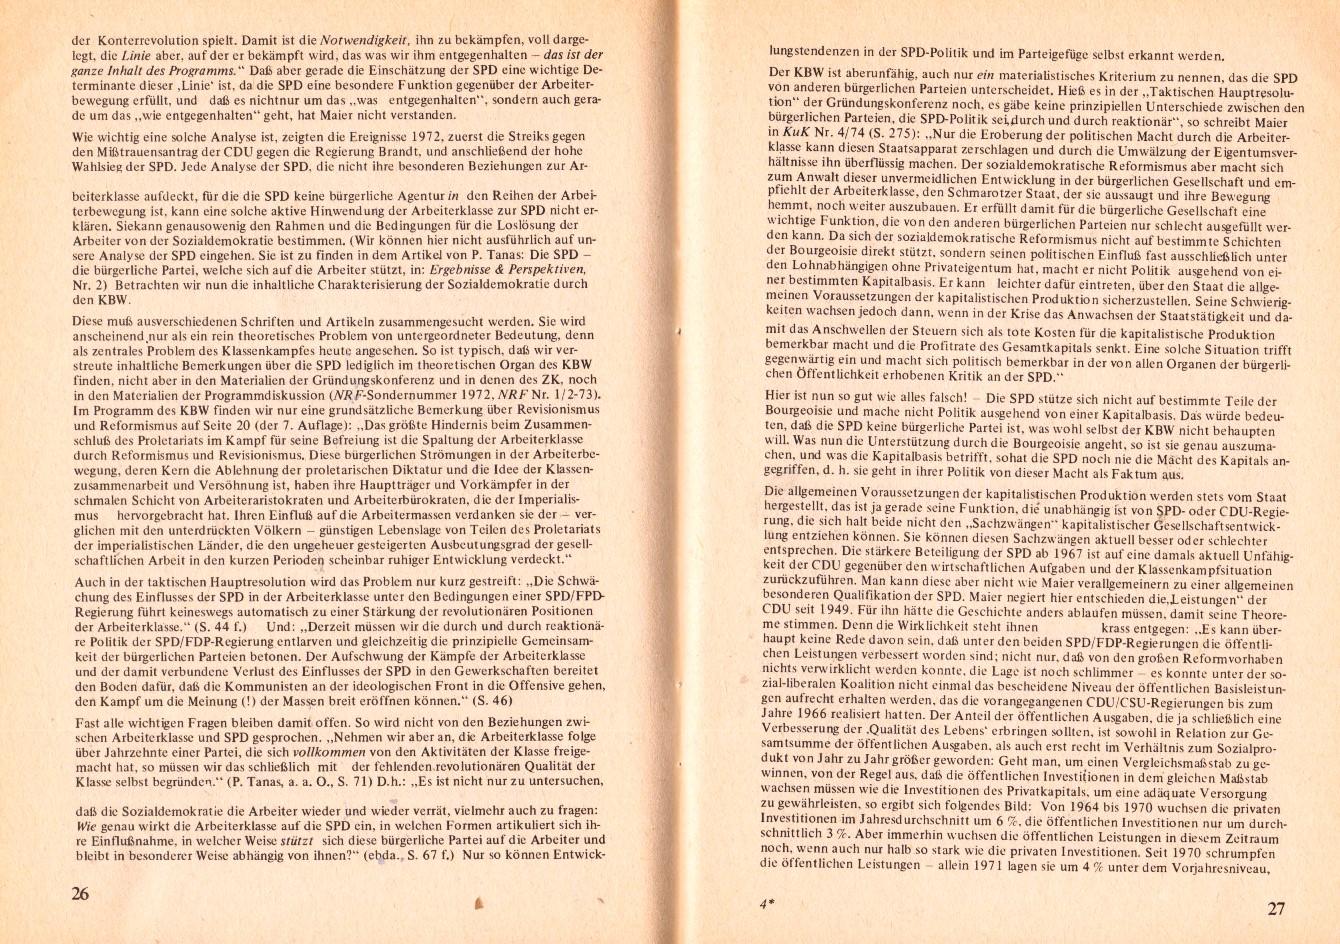 Spartacus_1975_Kritik_des_KBW_15